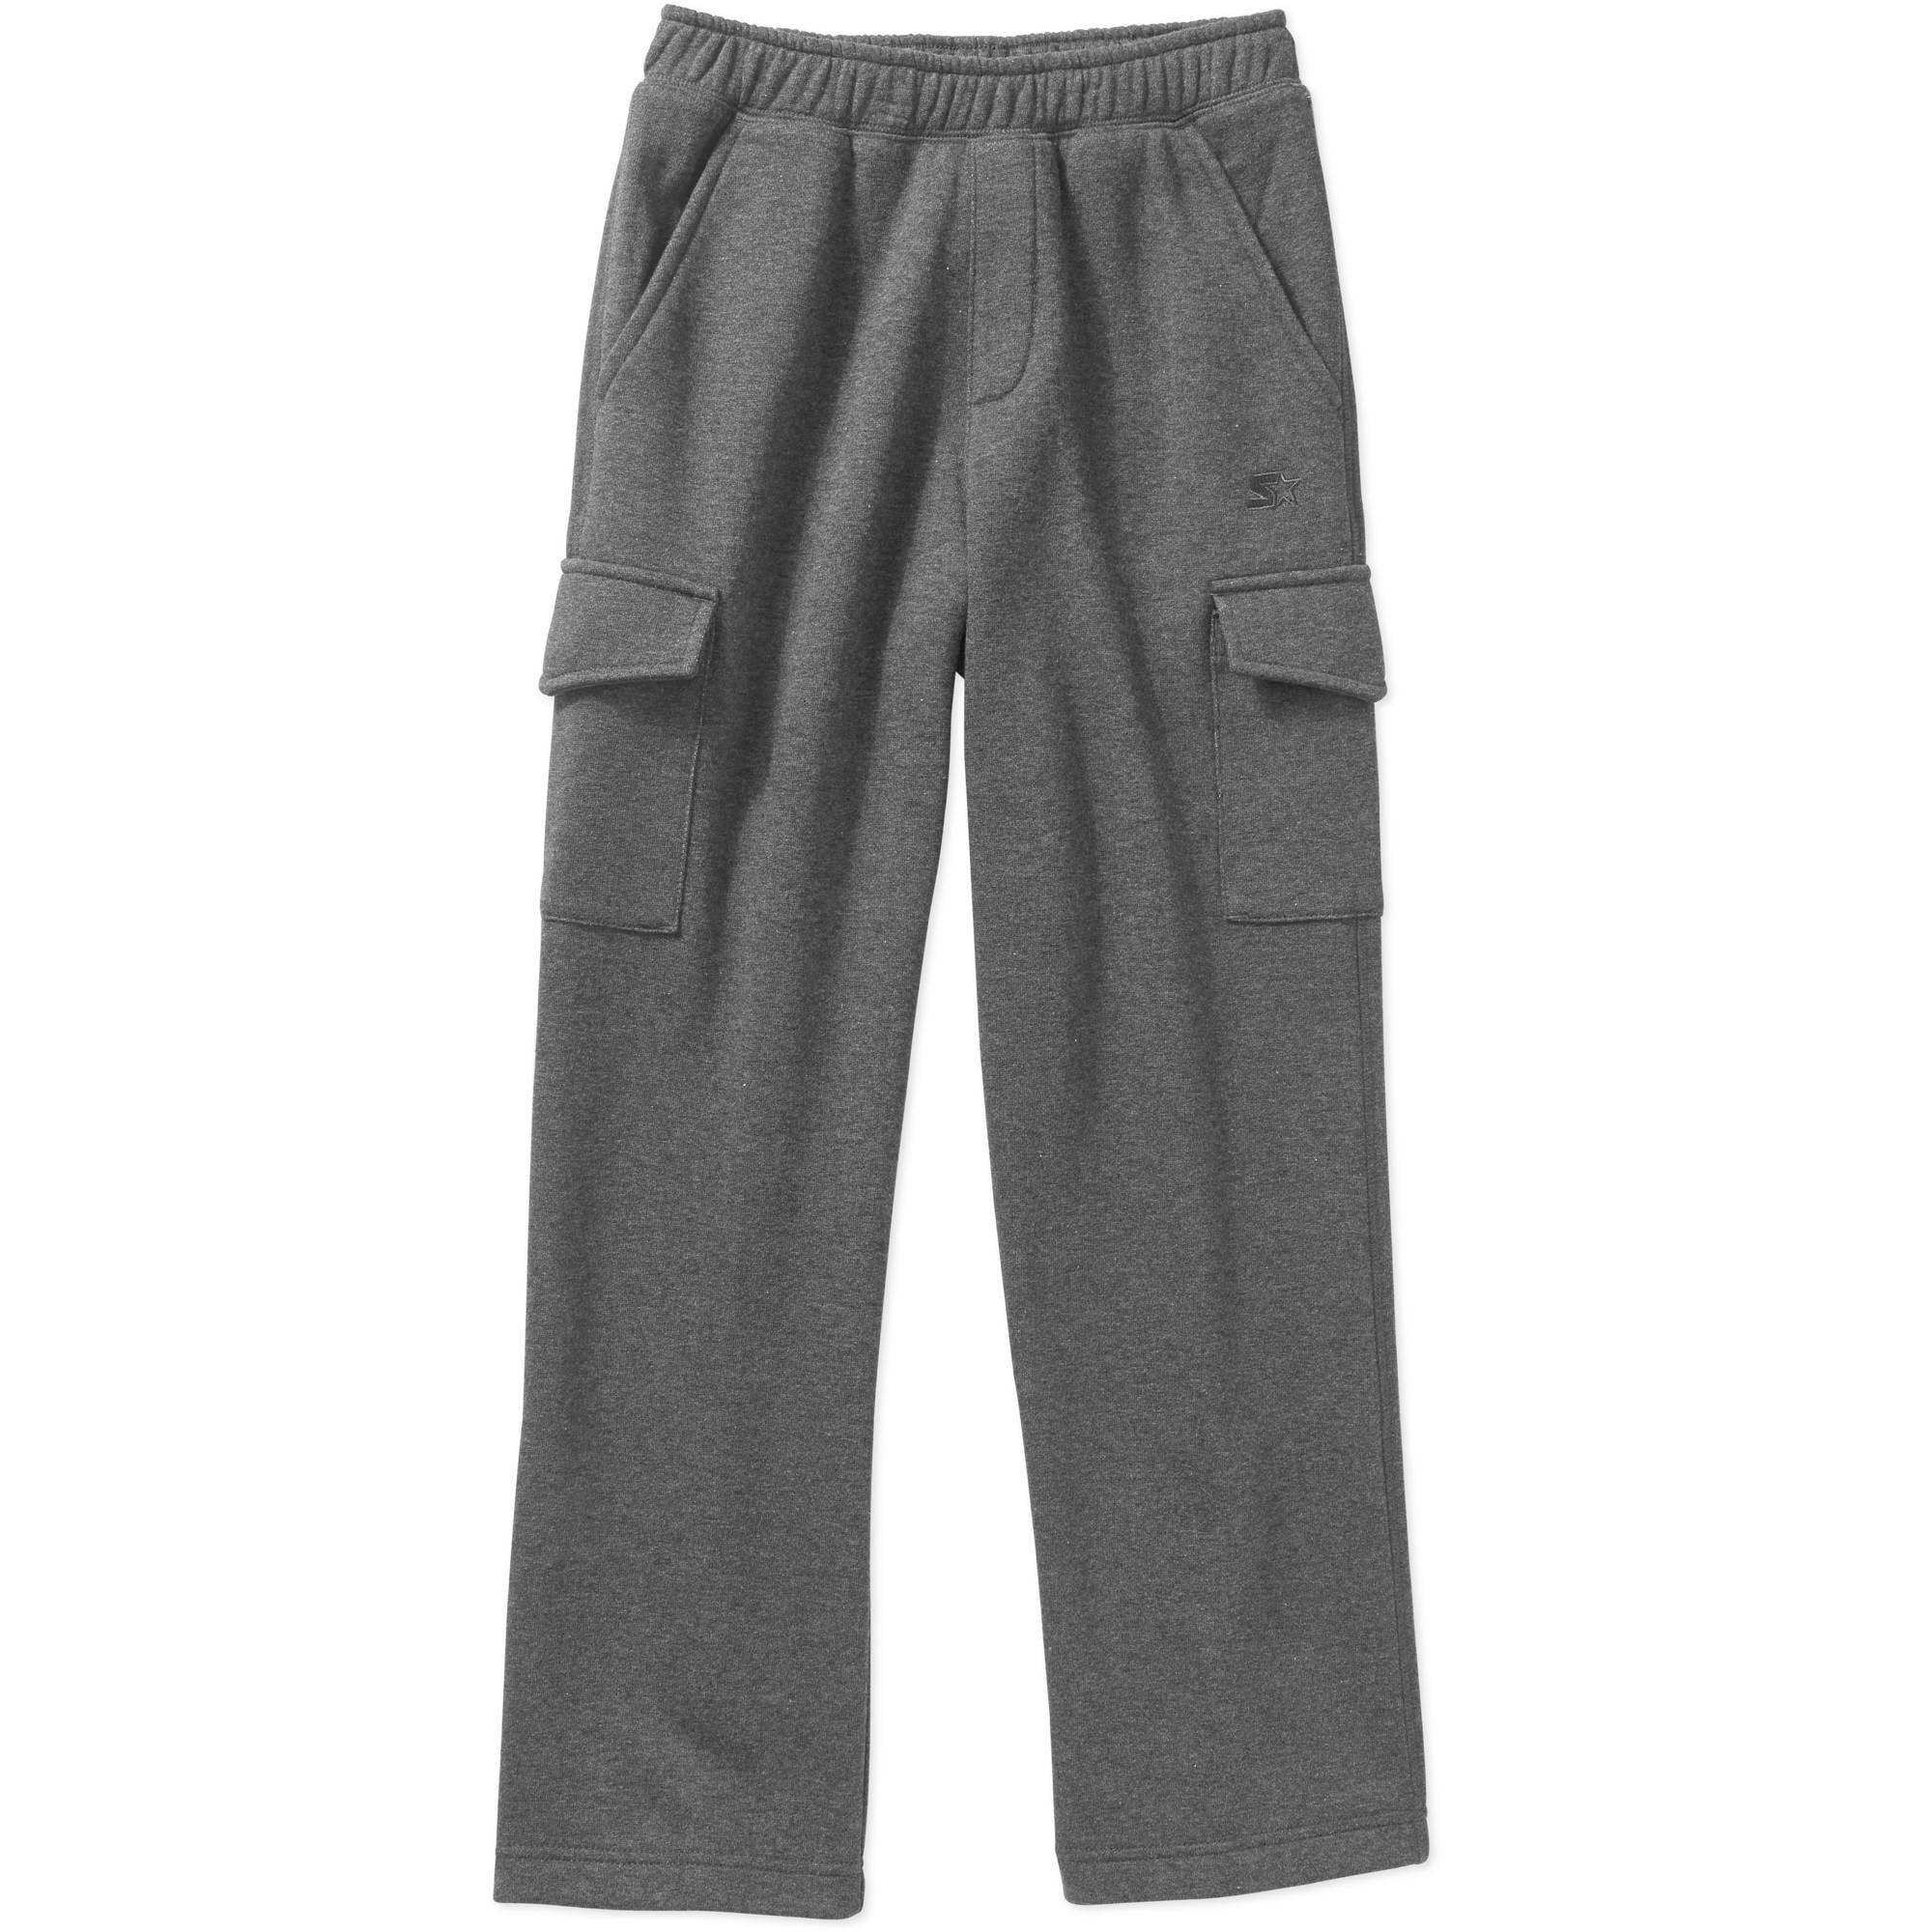 Starter Boys' Fleece Elastic Waistband Four Pocket Cargo Pants ...